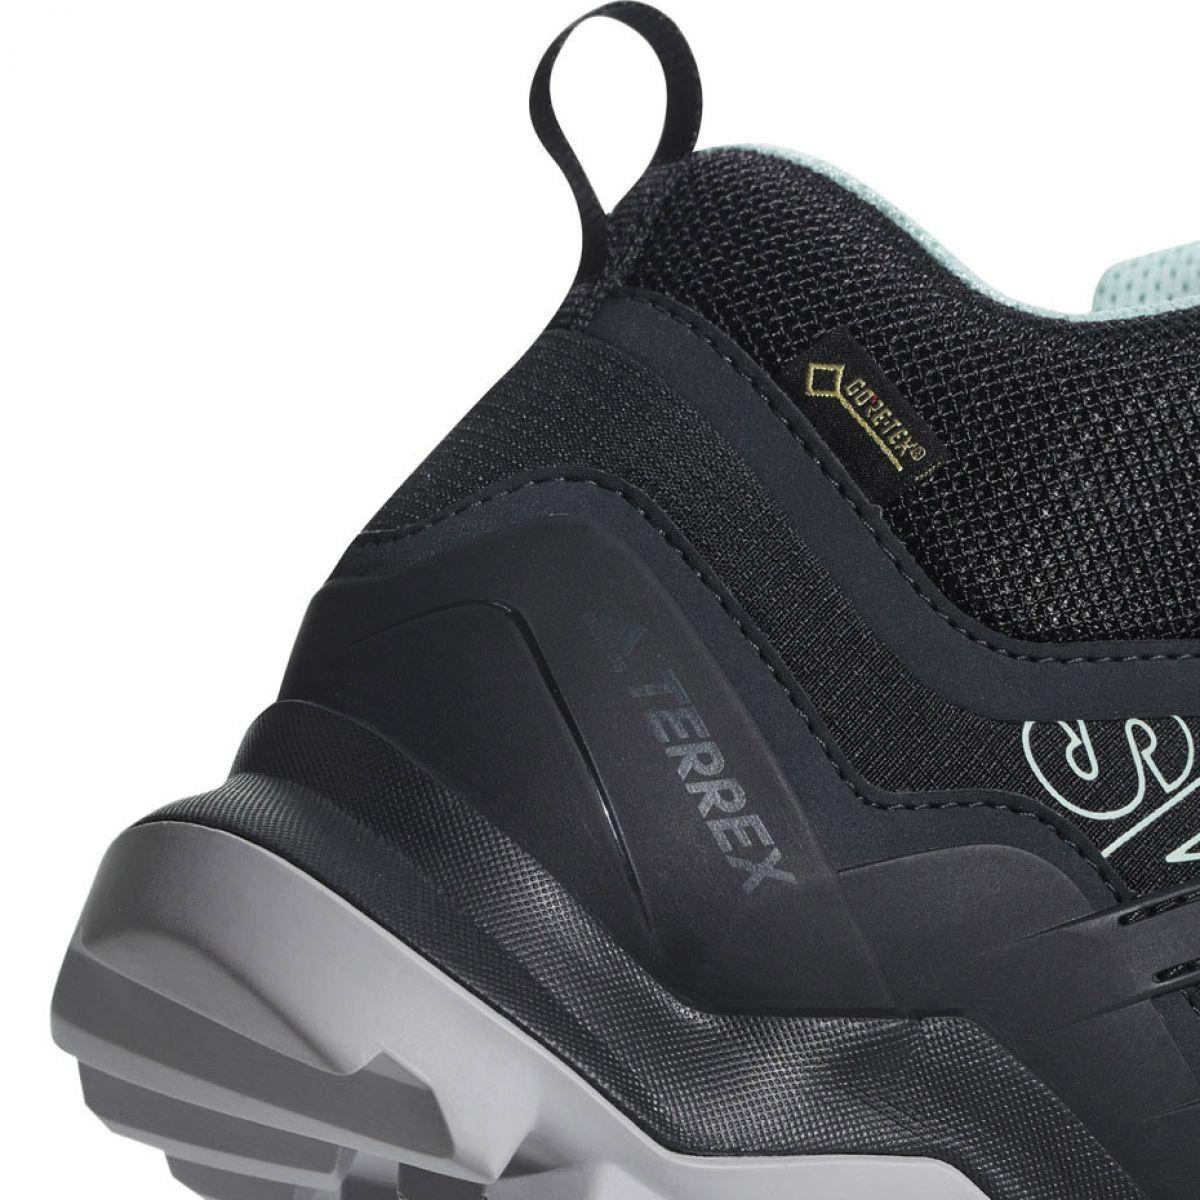 Buty Trekkingowe Adidas Terrex Swift R2 Mid Gtx W Cm7651 Czarne Sketchers Sneakers Adidas Shoes